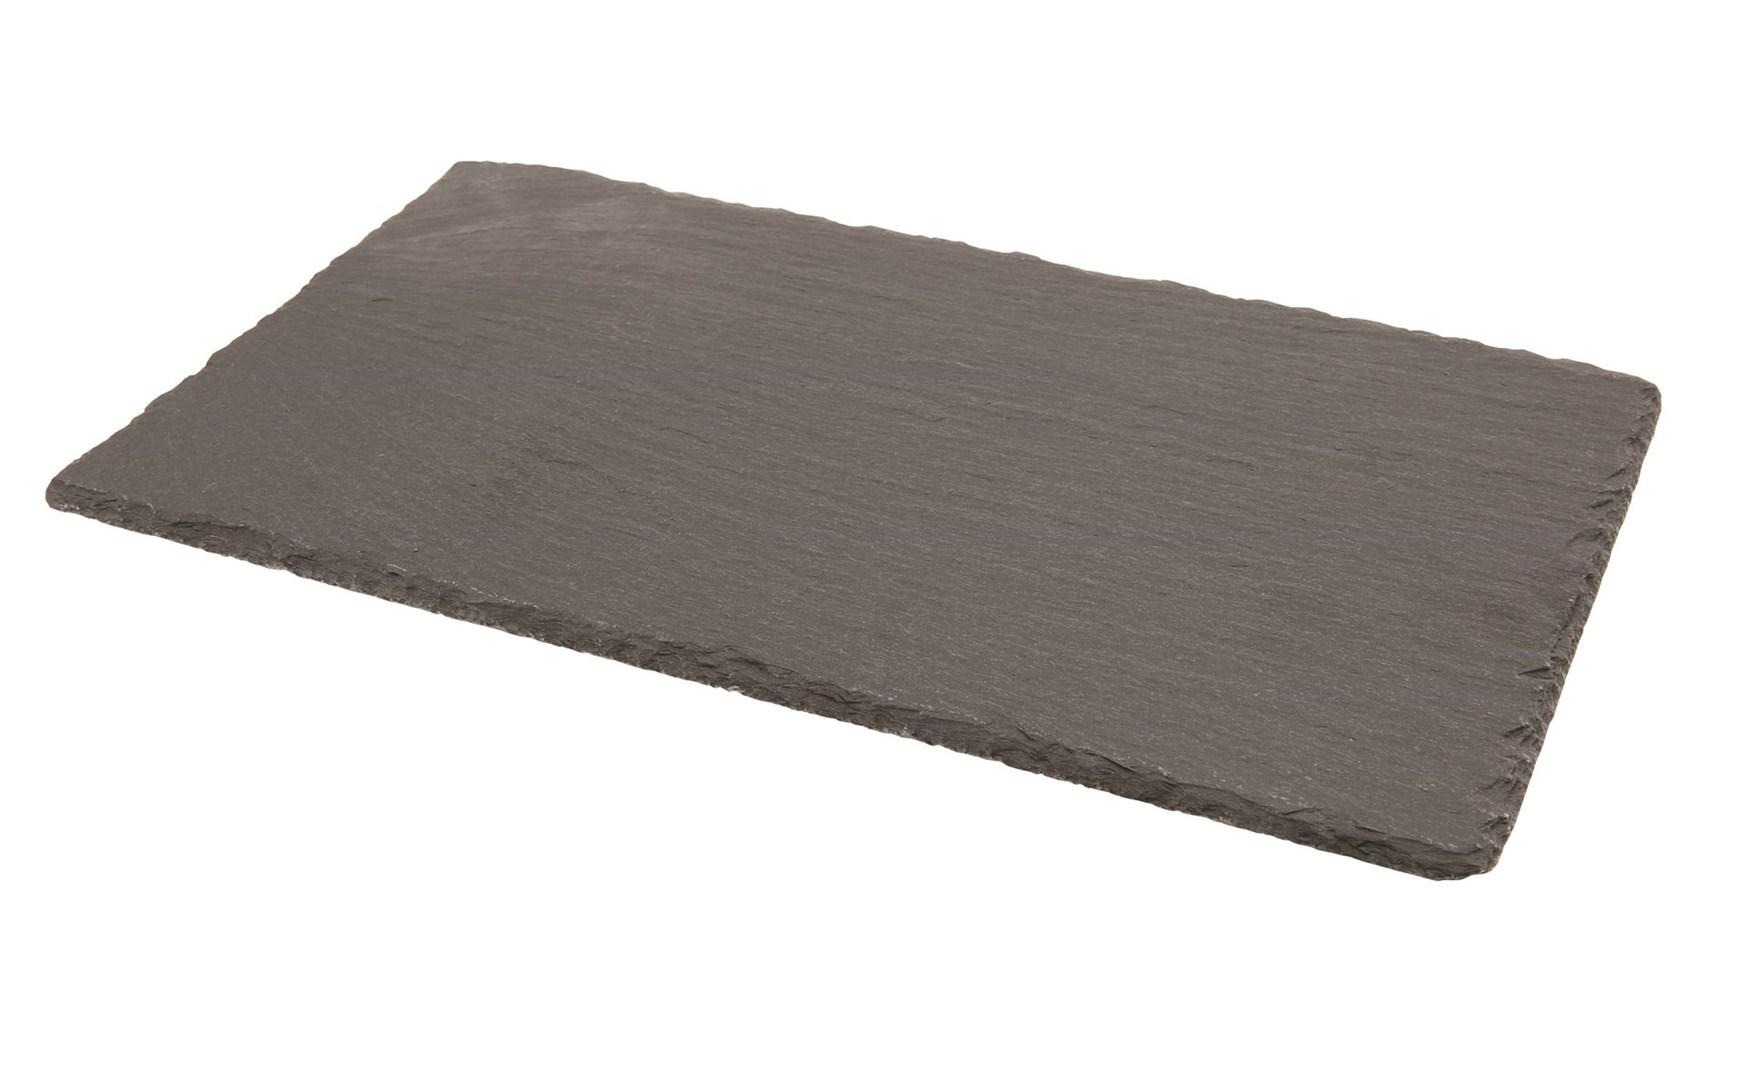 Productafbeelding Leistenen GN 1/3 plateau 32 x 18 cm